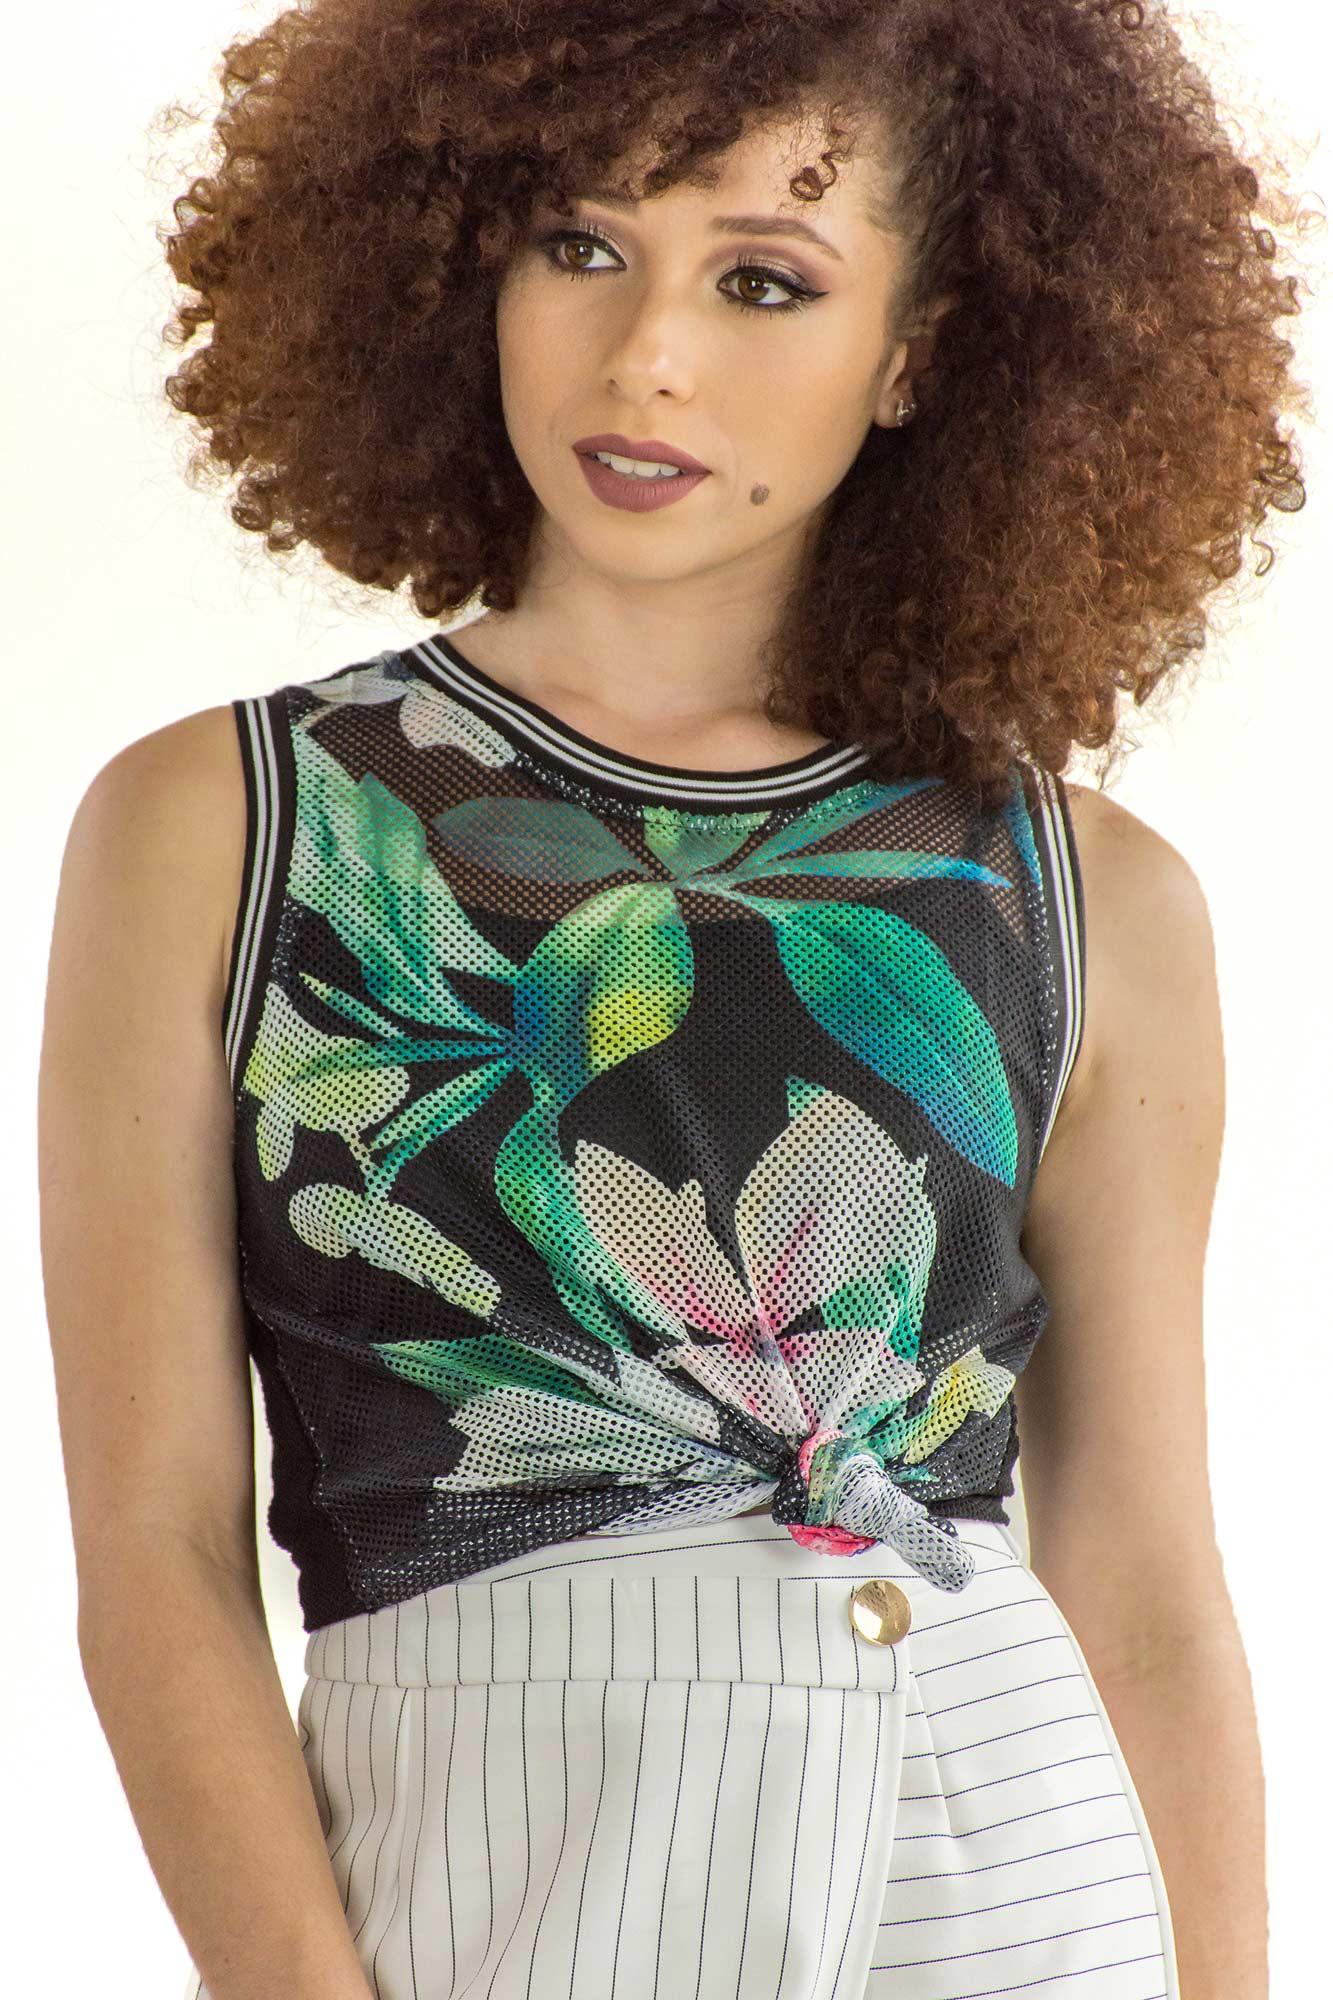 0a5983c9b NotoriaStore: Moda Feminina Florianópolis - Online Blusa Cropped ...